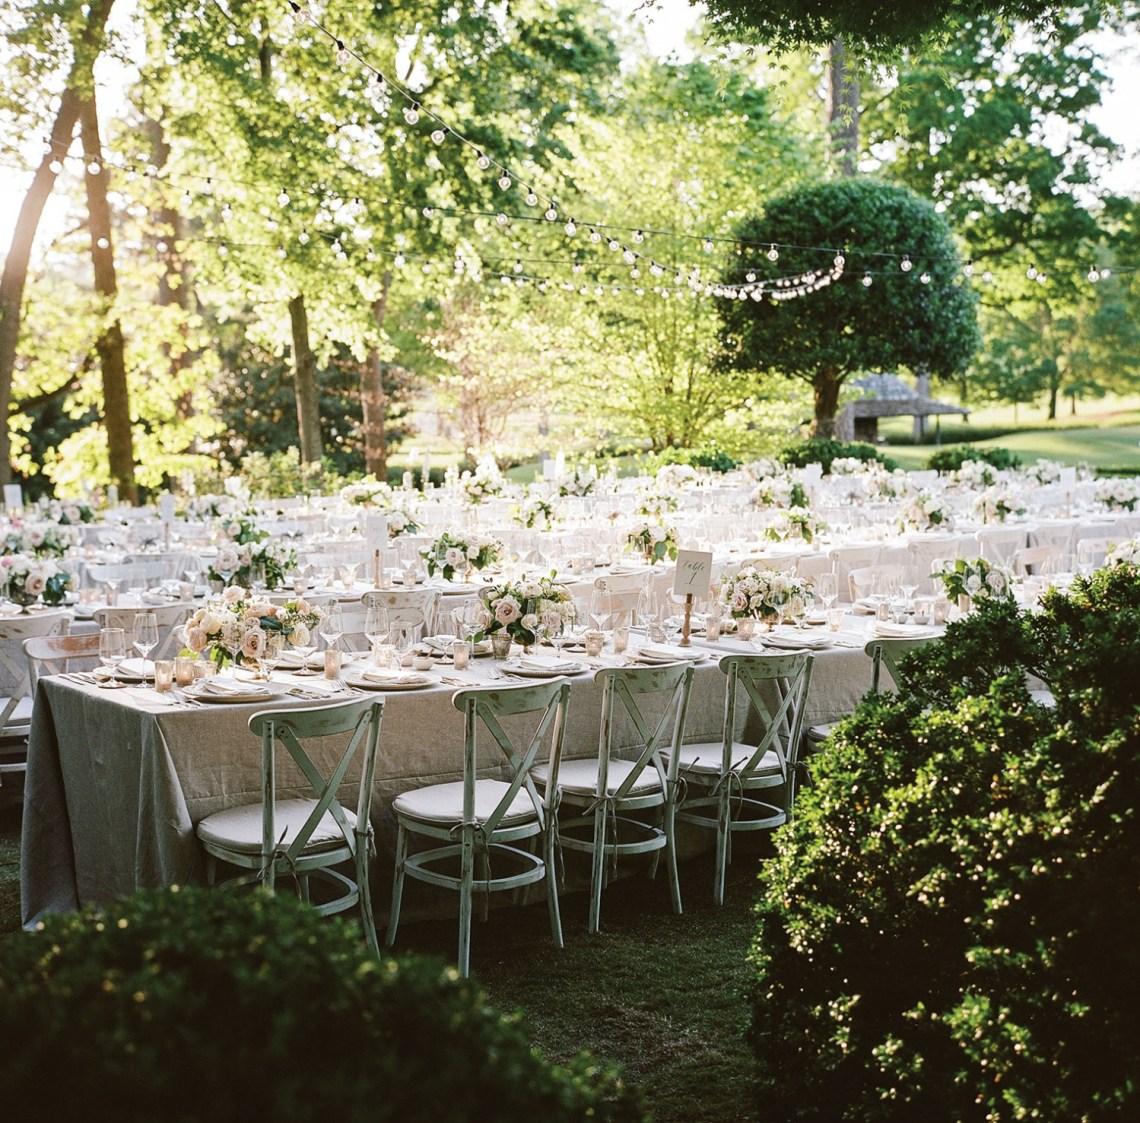 carleton rafield wedding party